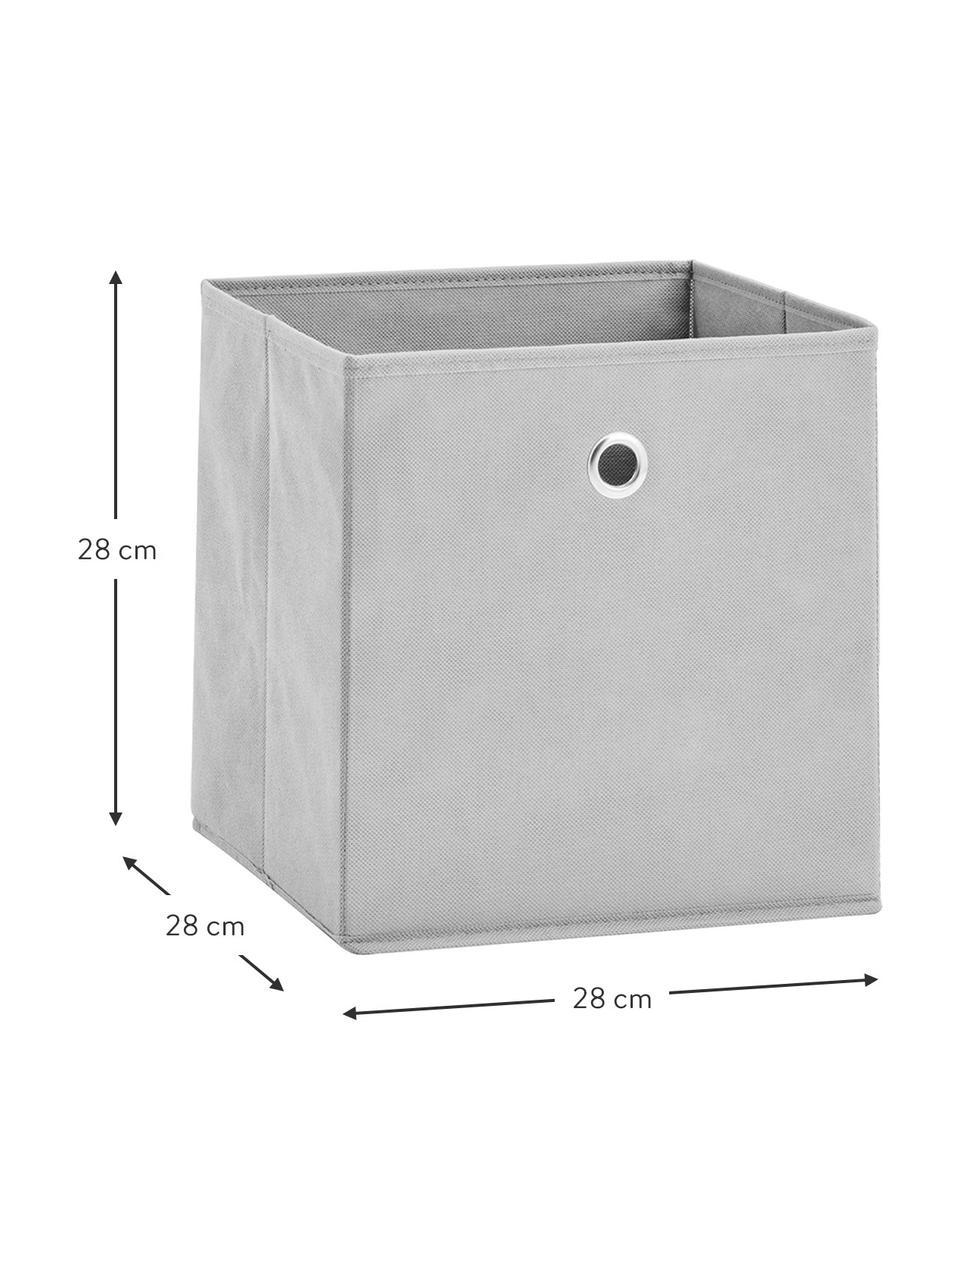 Aufbewahrungsbox Lisa, Bezug: Vlies, Gestell: Pappe, Metall, Grau, 28 x 28 cm